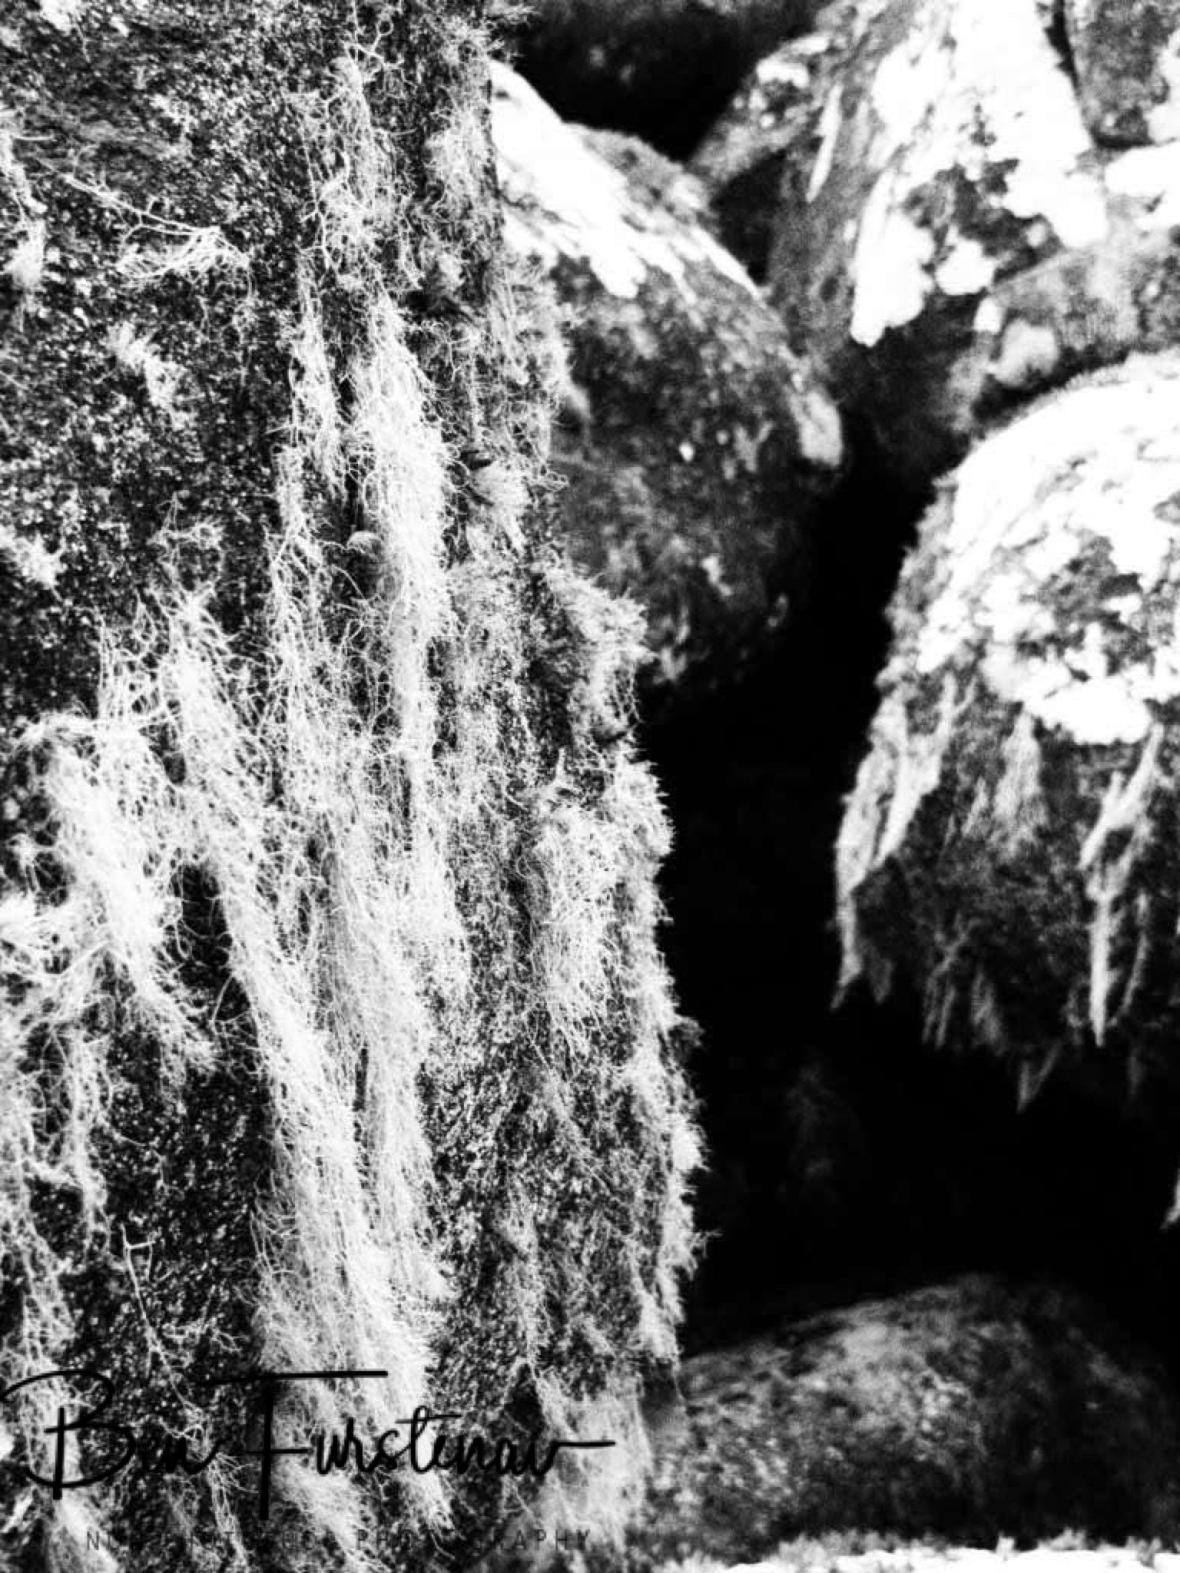 Moss covered granite boulders, Mulanje Mountains, Malawi